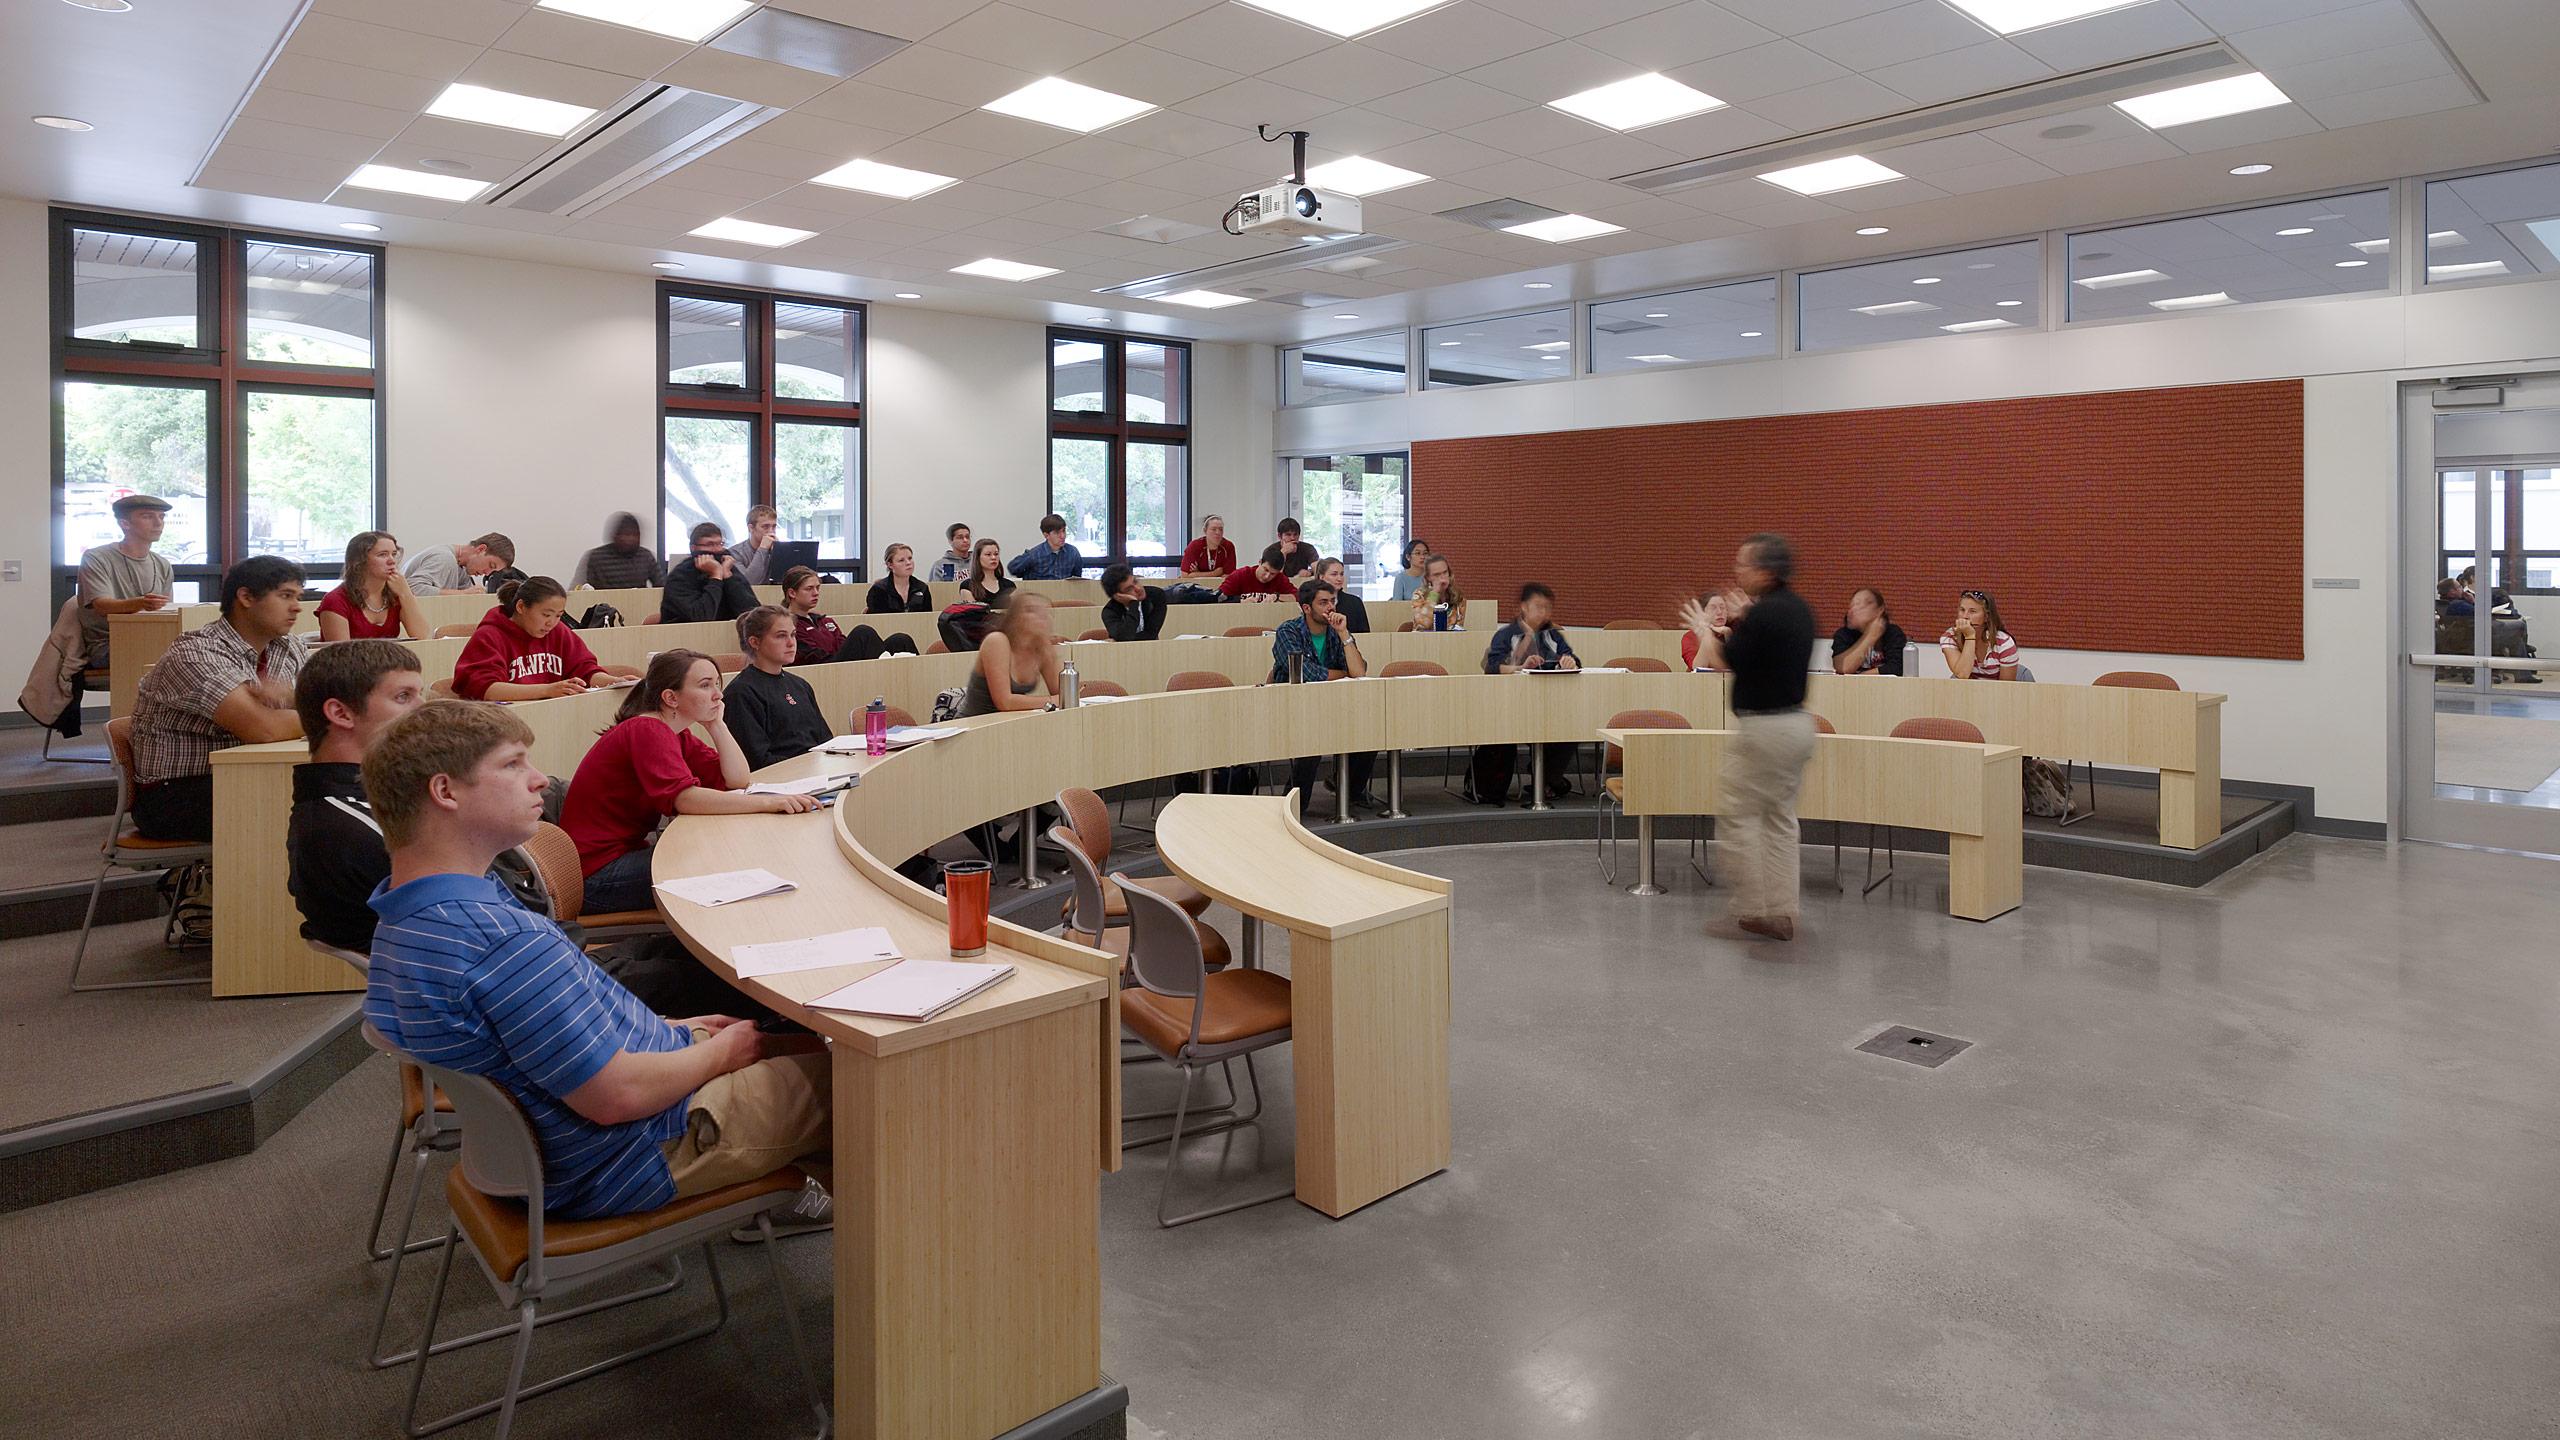 Yang and Yamazaki Environment and Energy Building – Stanford University / image 8